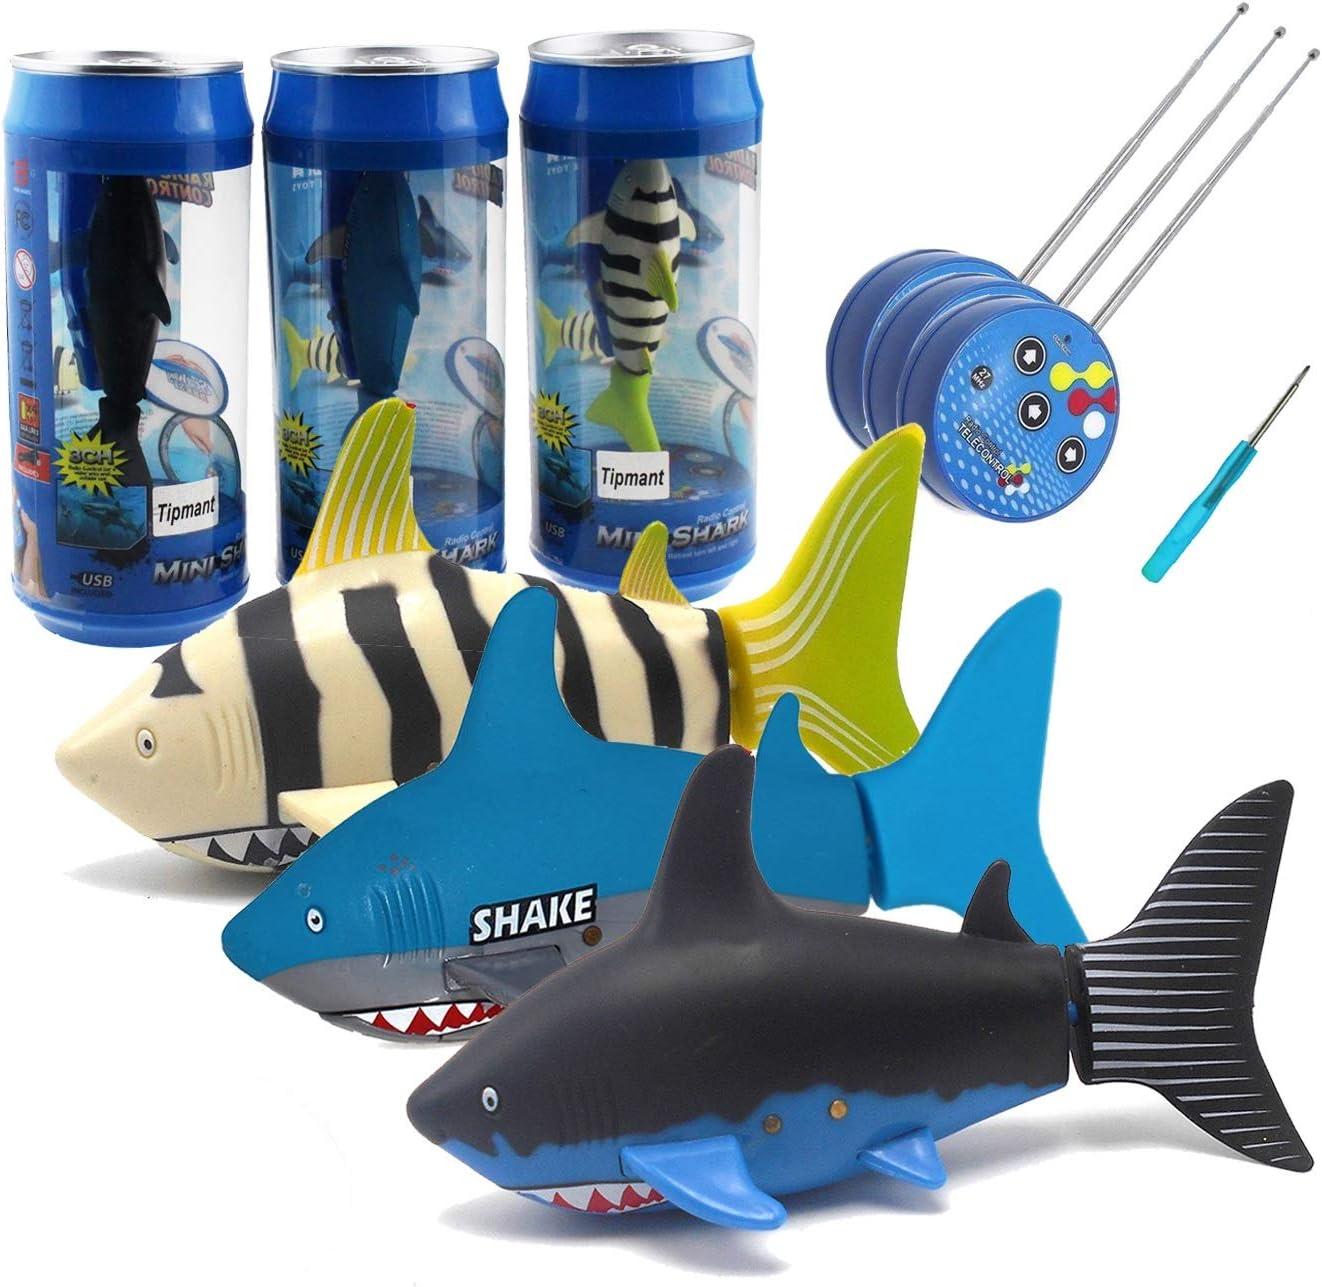 Tipmant Mini RC Fish Shark Radio Remote Control Boat Ships & Submarine for Fish Tank, Swimming Pool, Bathtub Kids Electric Animal Toy - 3 Pack